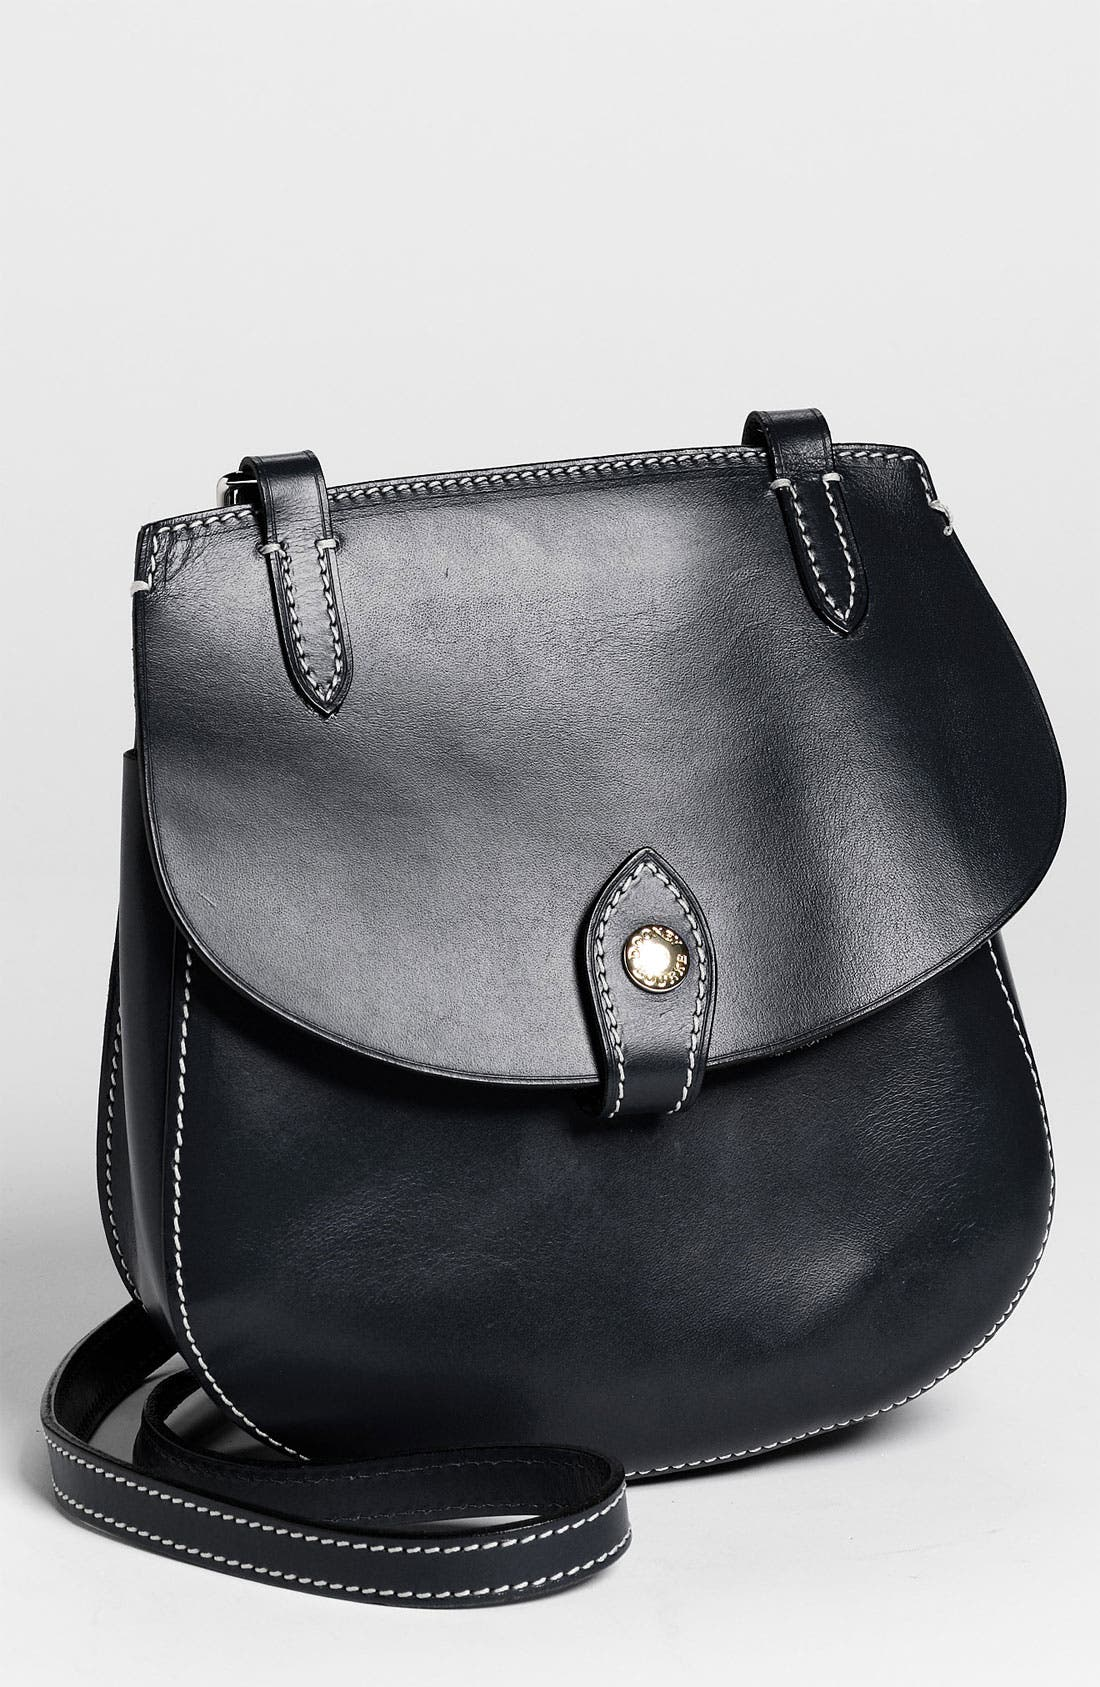 Alternate Image 1 Selected - Dooney & Bourke Leather Crossbody Bag